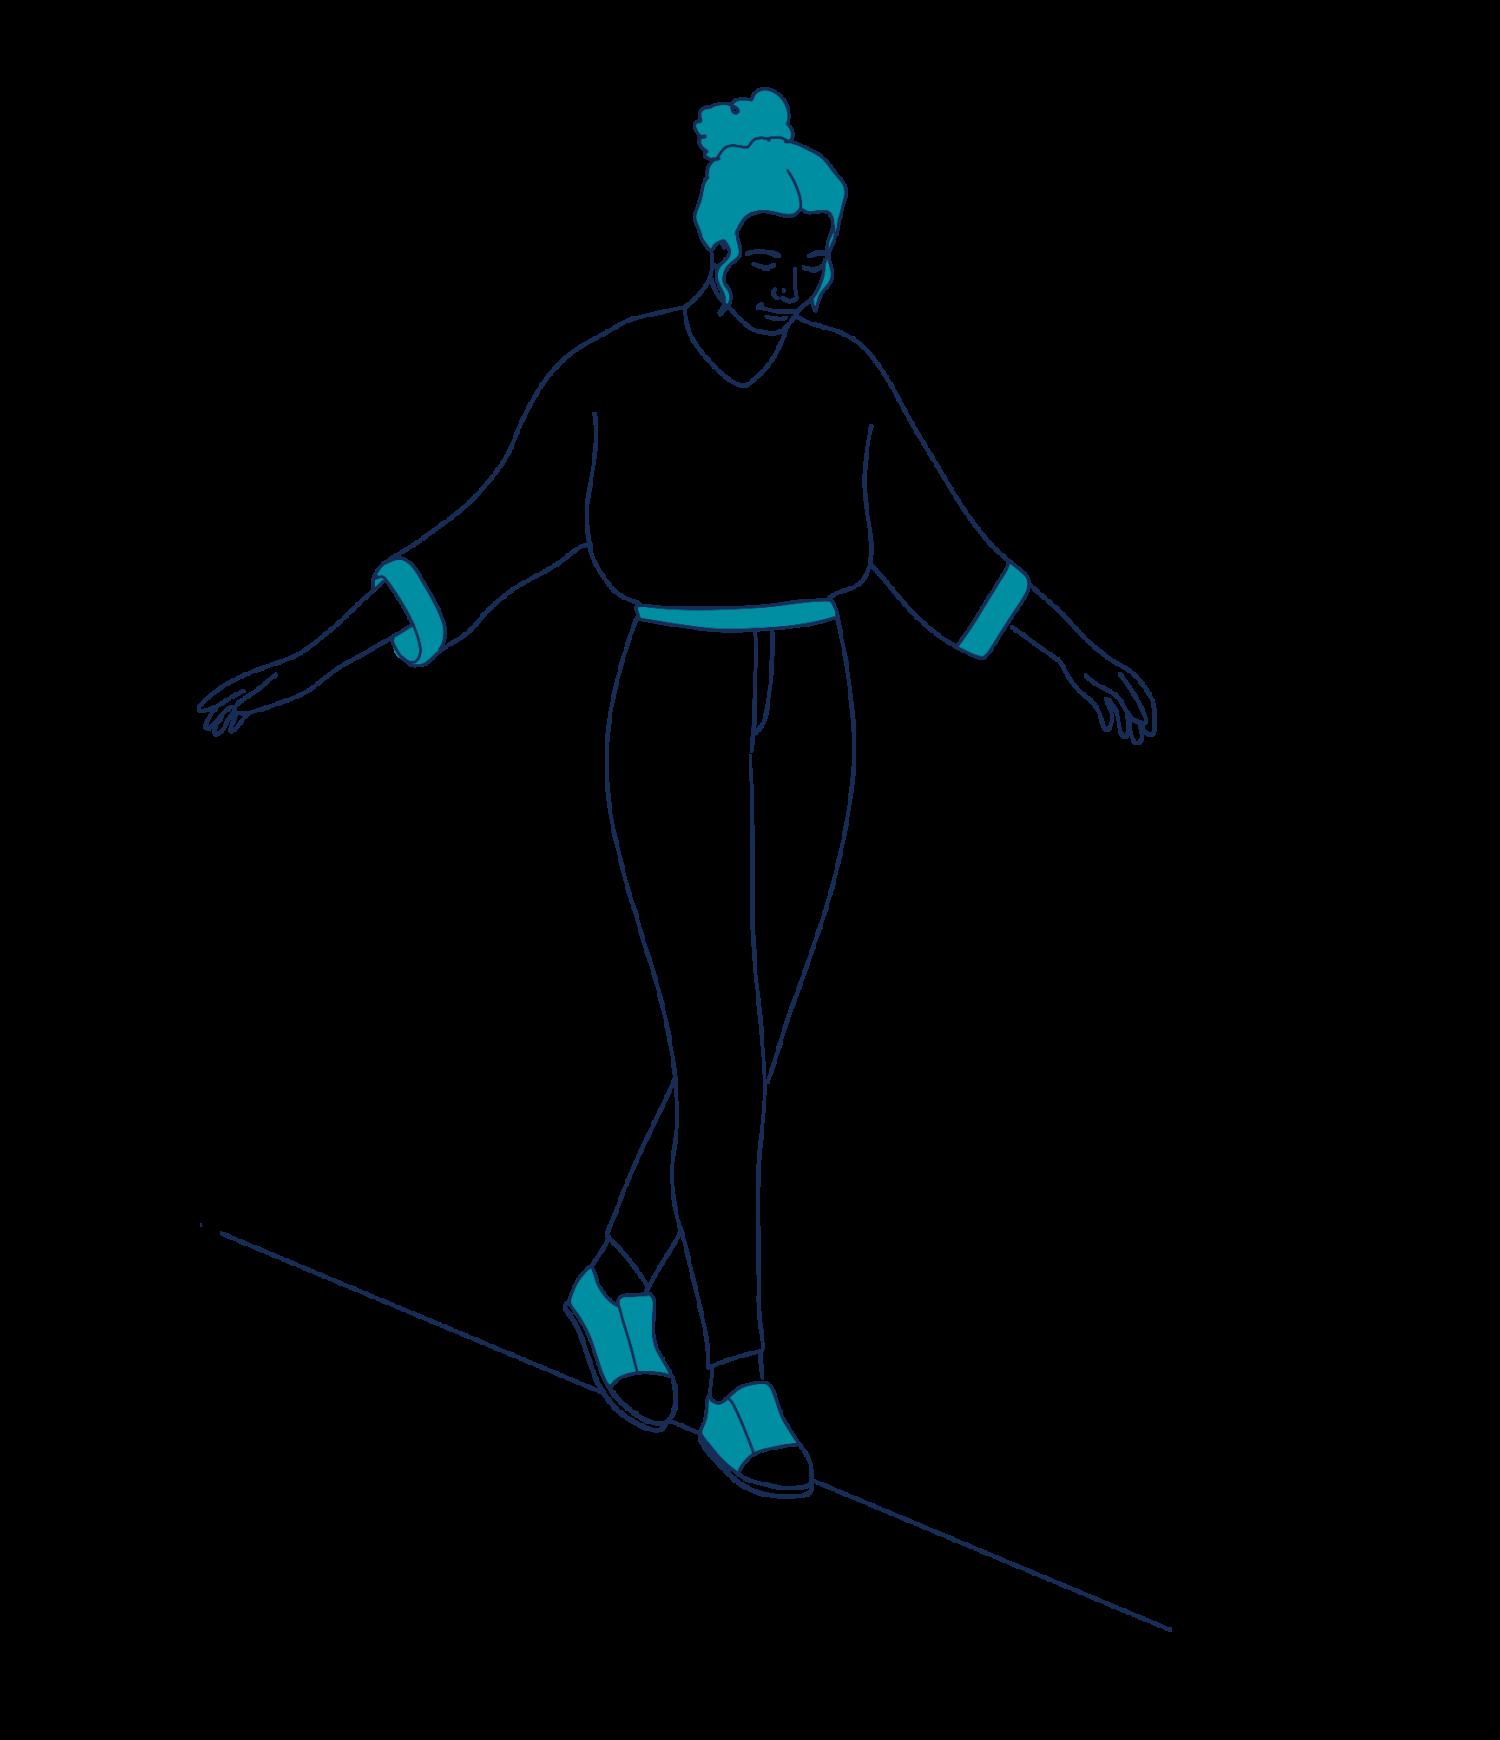 recoverwell-woman-walking-line